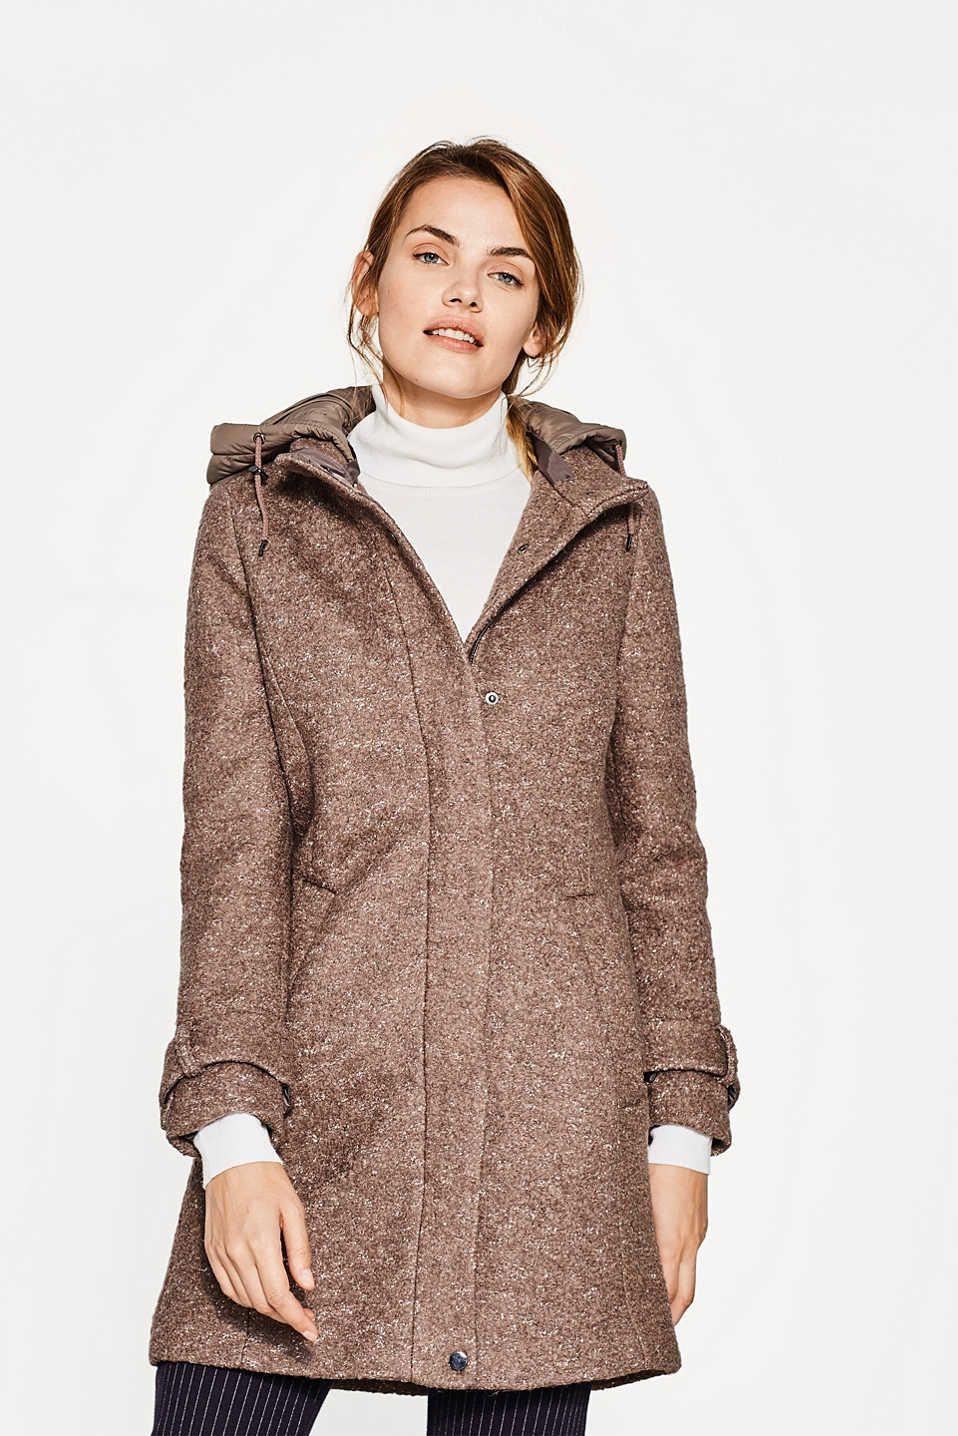 Esprit Boucle Mantel Mit Abnehmbarer Kapuze Boucle Mantel Damenmode Mode